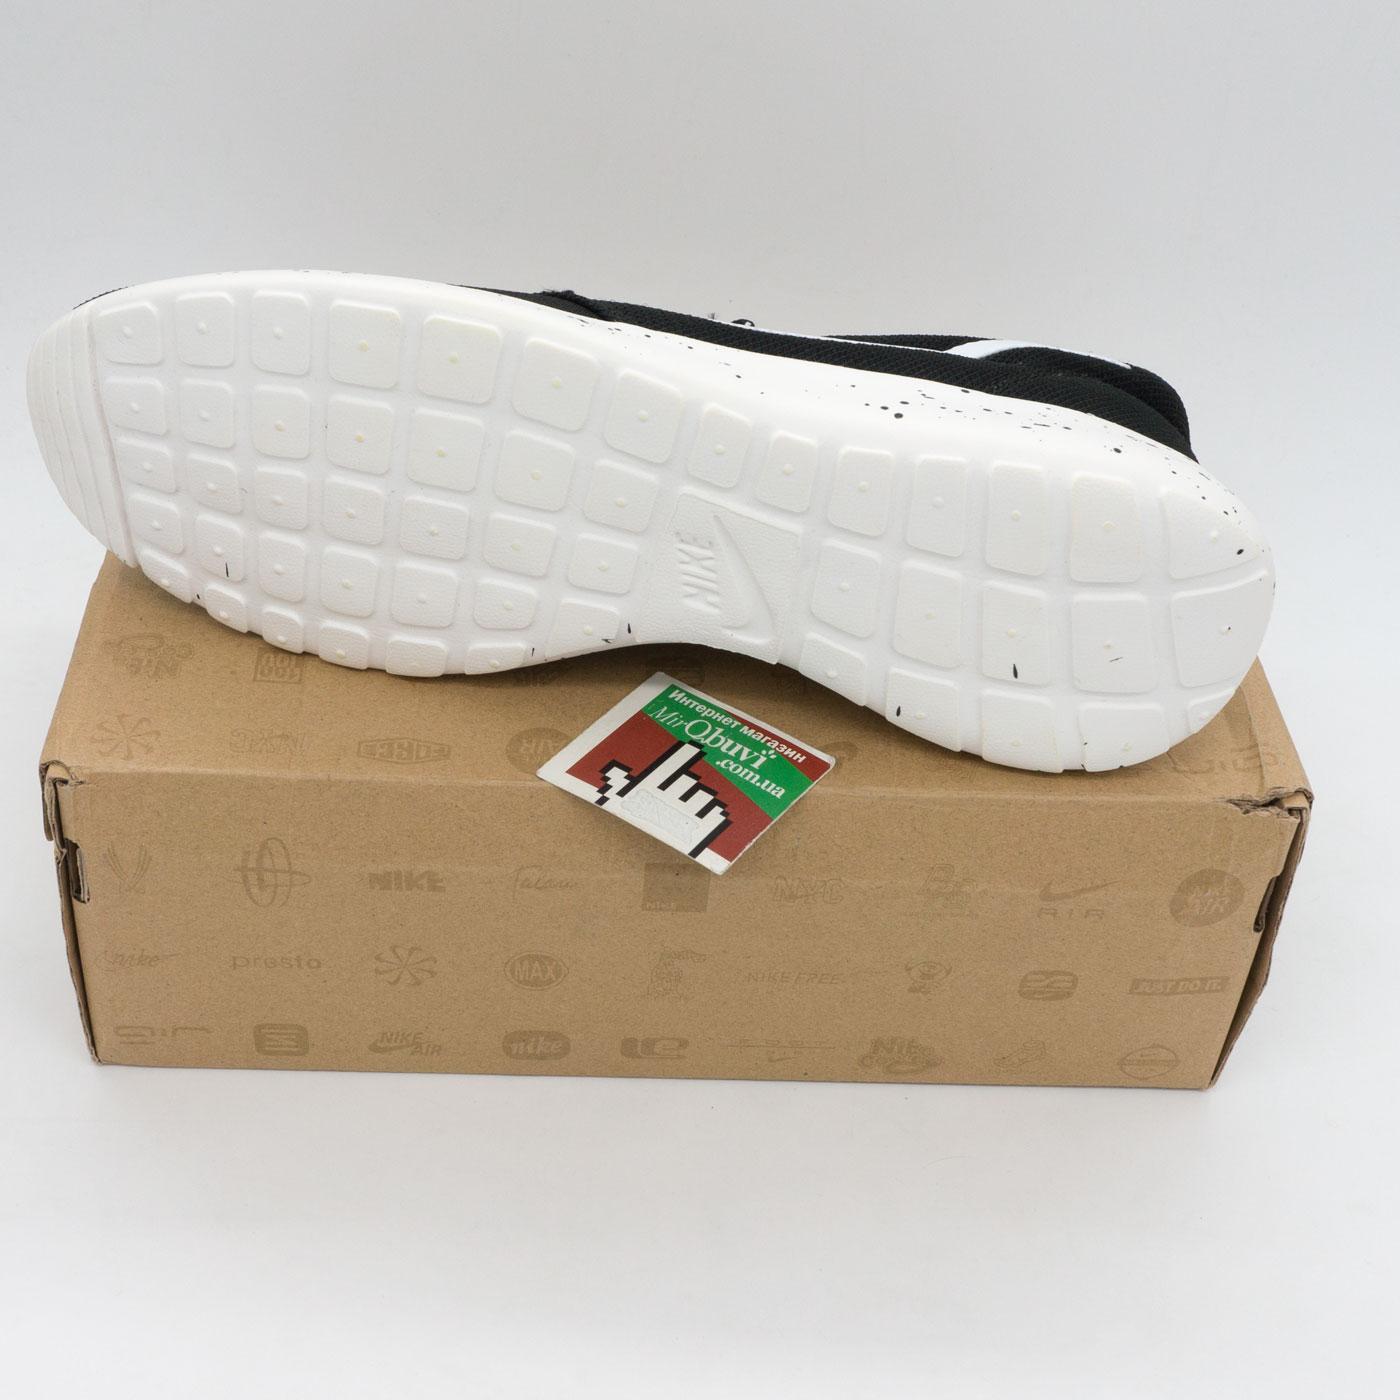 фото bottom Nike Roshe Run черно белые в крапинку. bottom